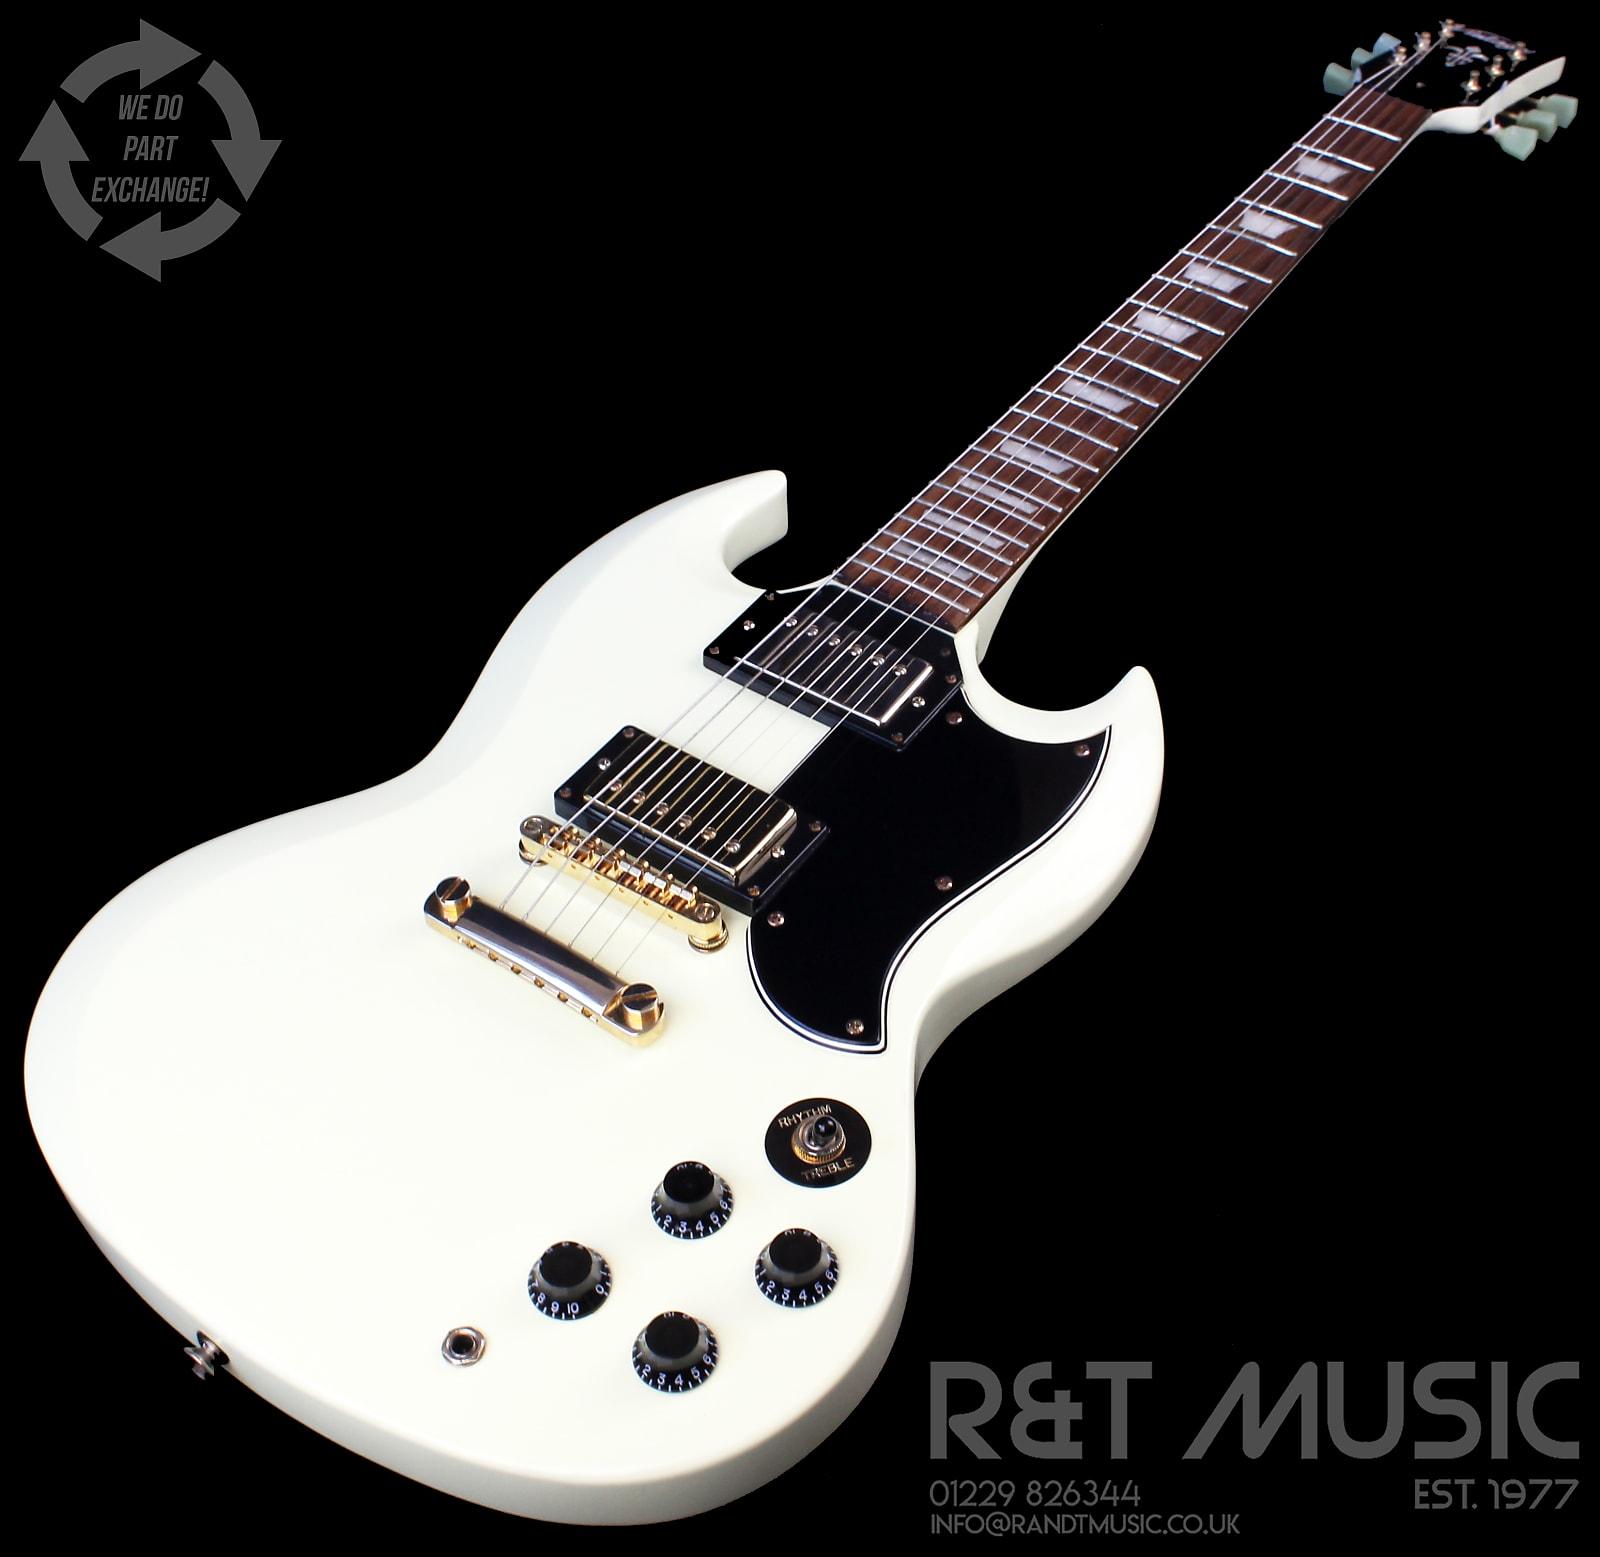 Vintage Vs6 Reissued Electric Guitar In Vintage White